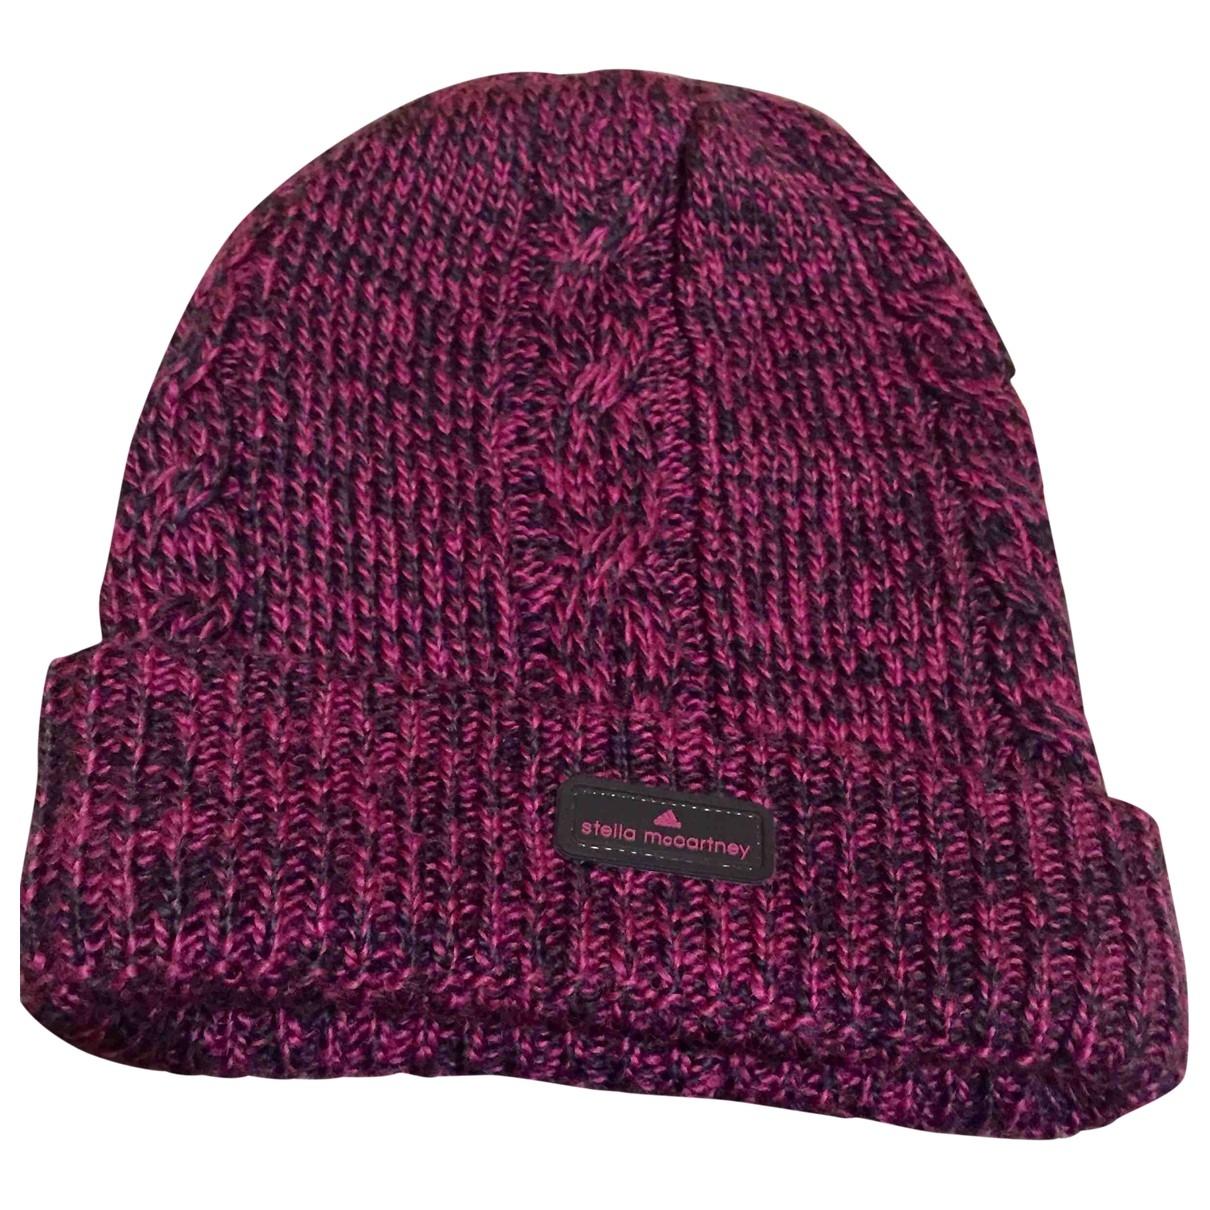 Stella Mccartney Pour Adidas \N Purple Cotton hat for Women M International